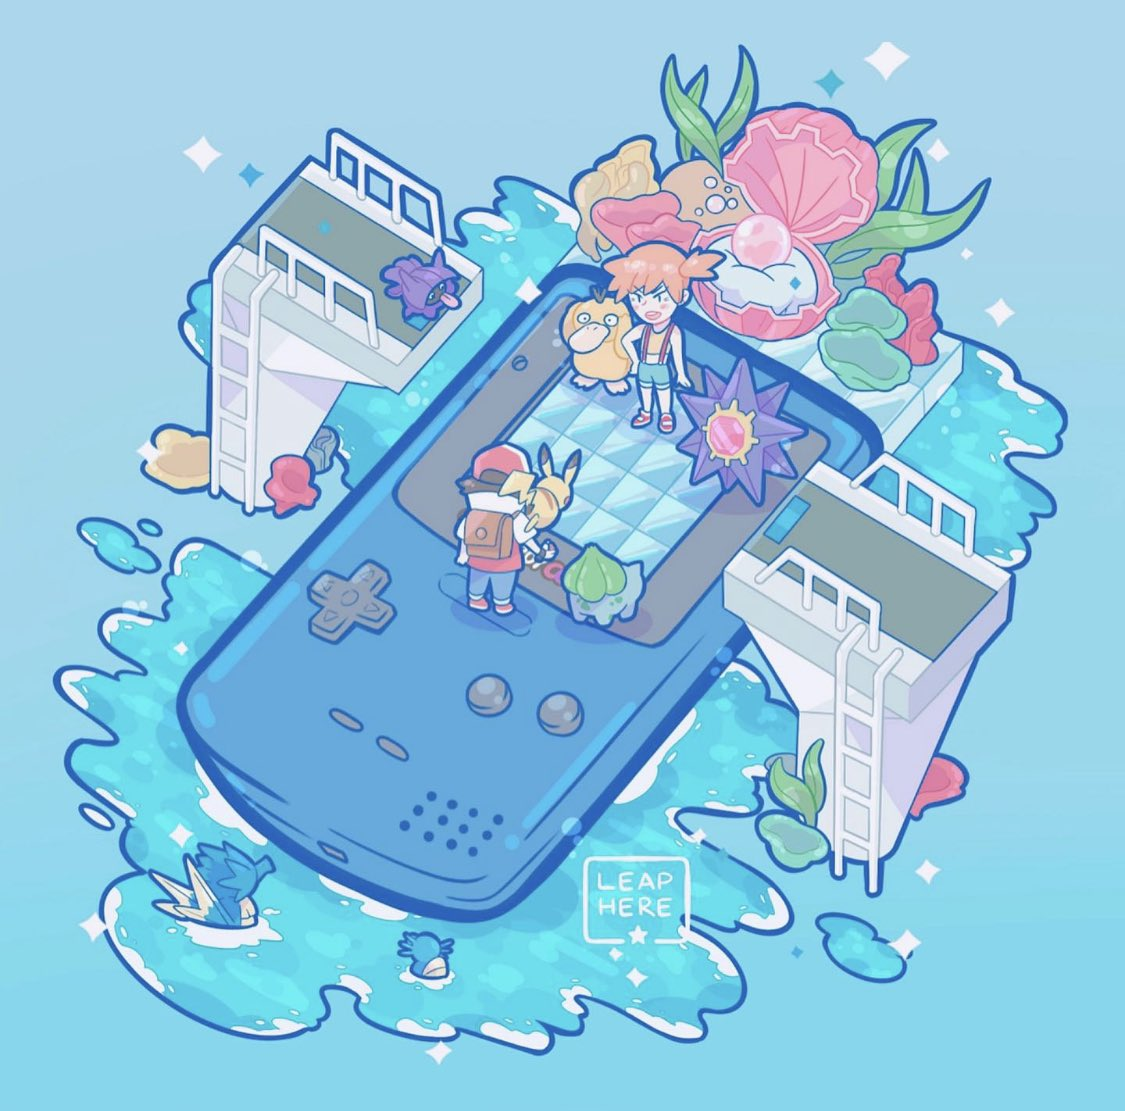 1boy 1girl backpack bag black_wristband blue_theme bridge bulbasaur commentary creature english_commentary game_boy_color gen_1_pokemon gym_leader handheld_game_console horsea kasumi_(pokemon) ladder pearl_(gemstone) pikachu pokemon pokemon_(anime) pokemon_(classic_anime) pokemon_(creature) pokemon_(game) pokemon_gym pokemon_on_shoulder pokemon_rgby pokemon_trainer psyduck red_(pokemon) seadra seashell shell shellder side_ponytail signature starmie tongue tongue_out water yamato-leaphere